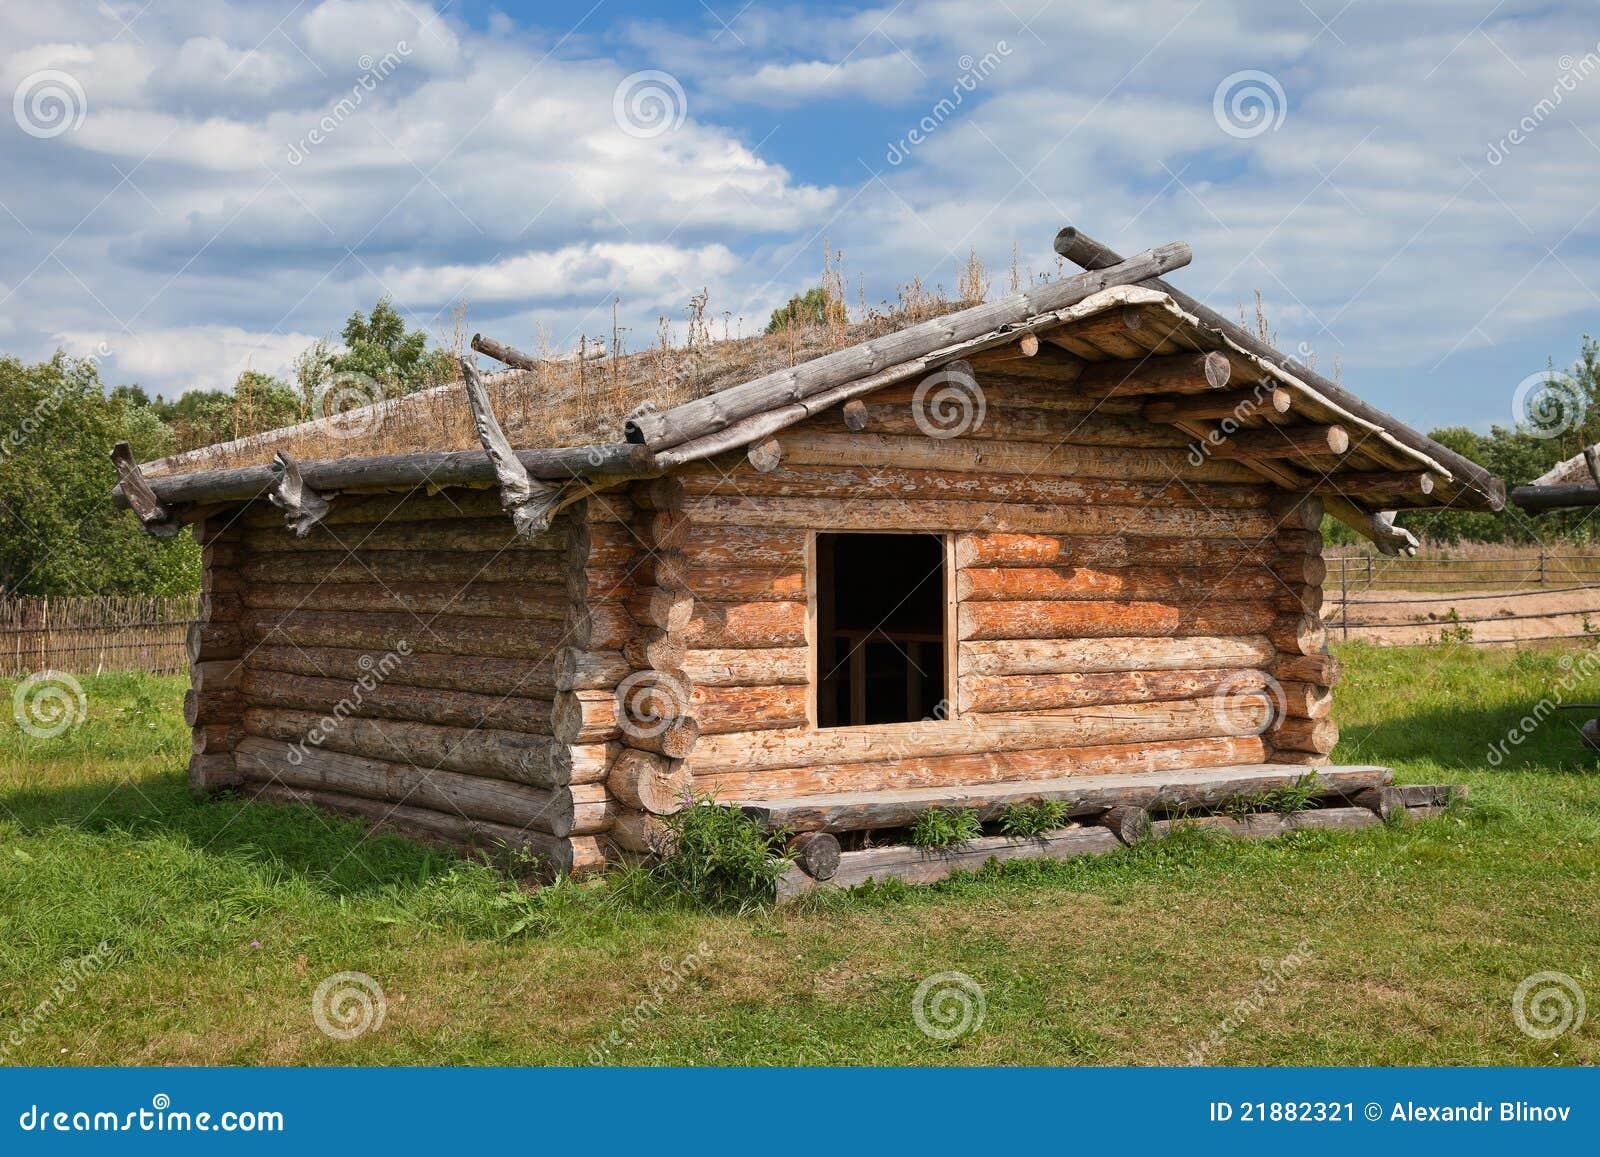 Casa de madera rusa tradicional antigua imagen de archivo - Imagenes de casas de madera ...